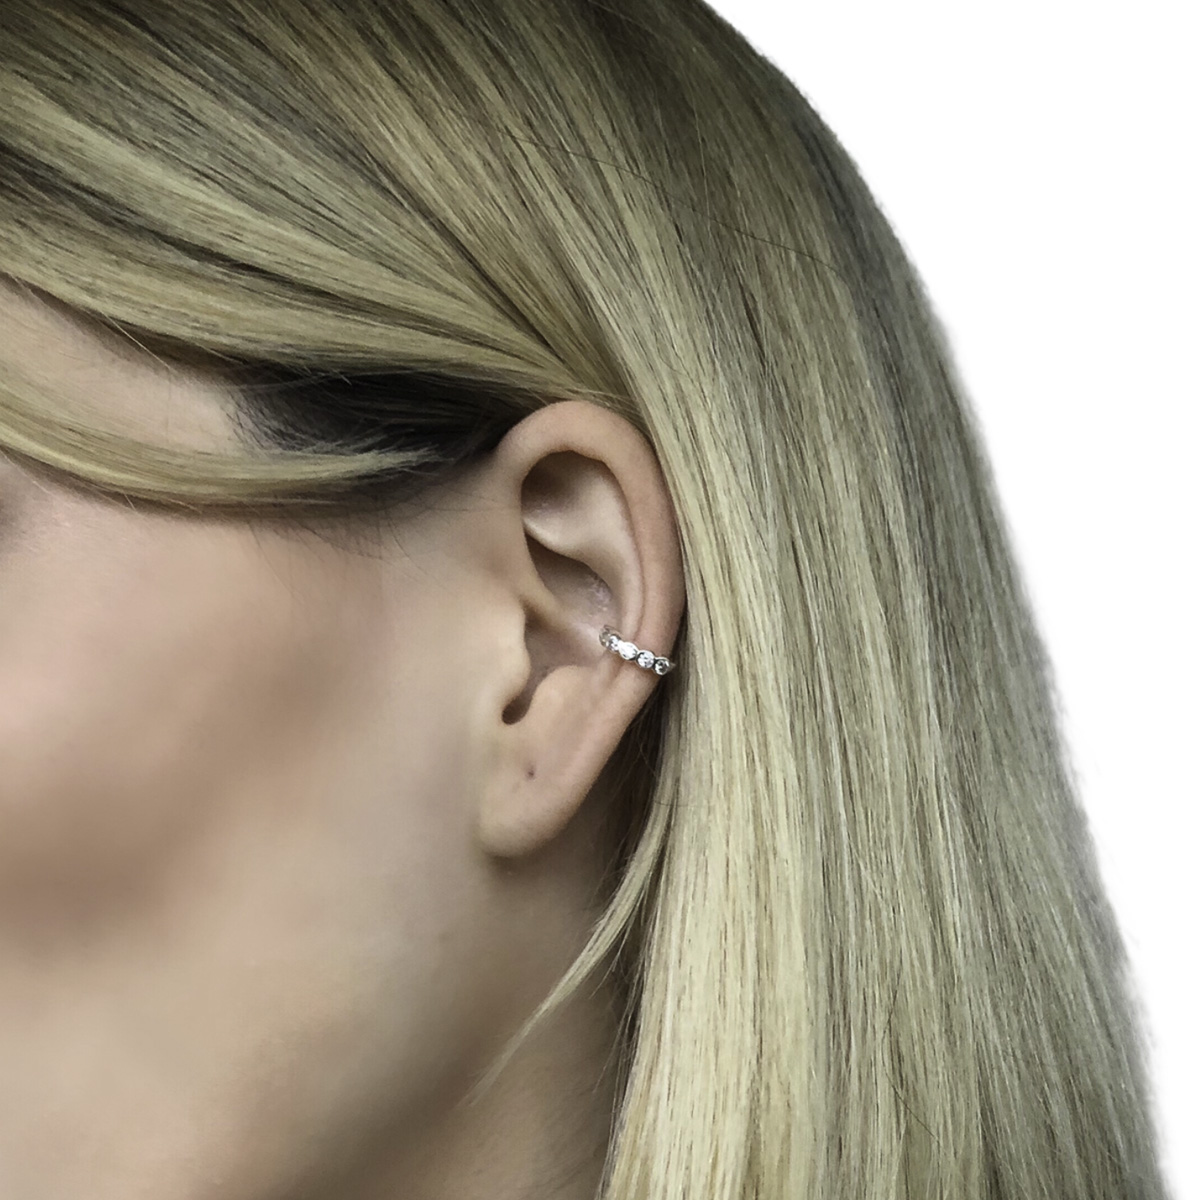 Piercing fake joia prata de lei 925 pura 6 zircônias